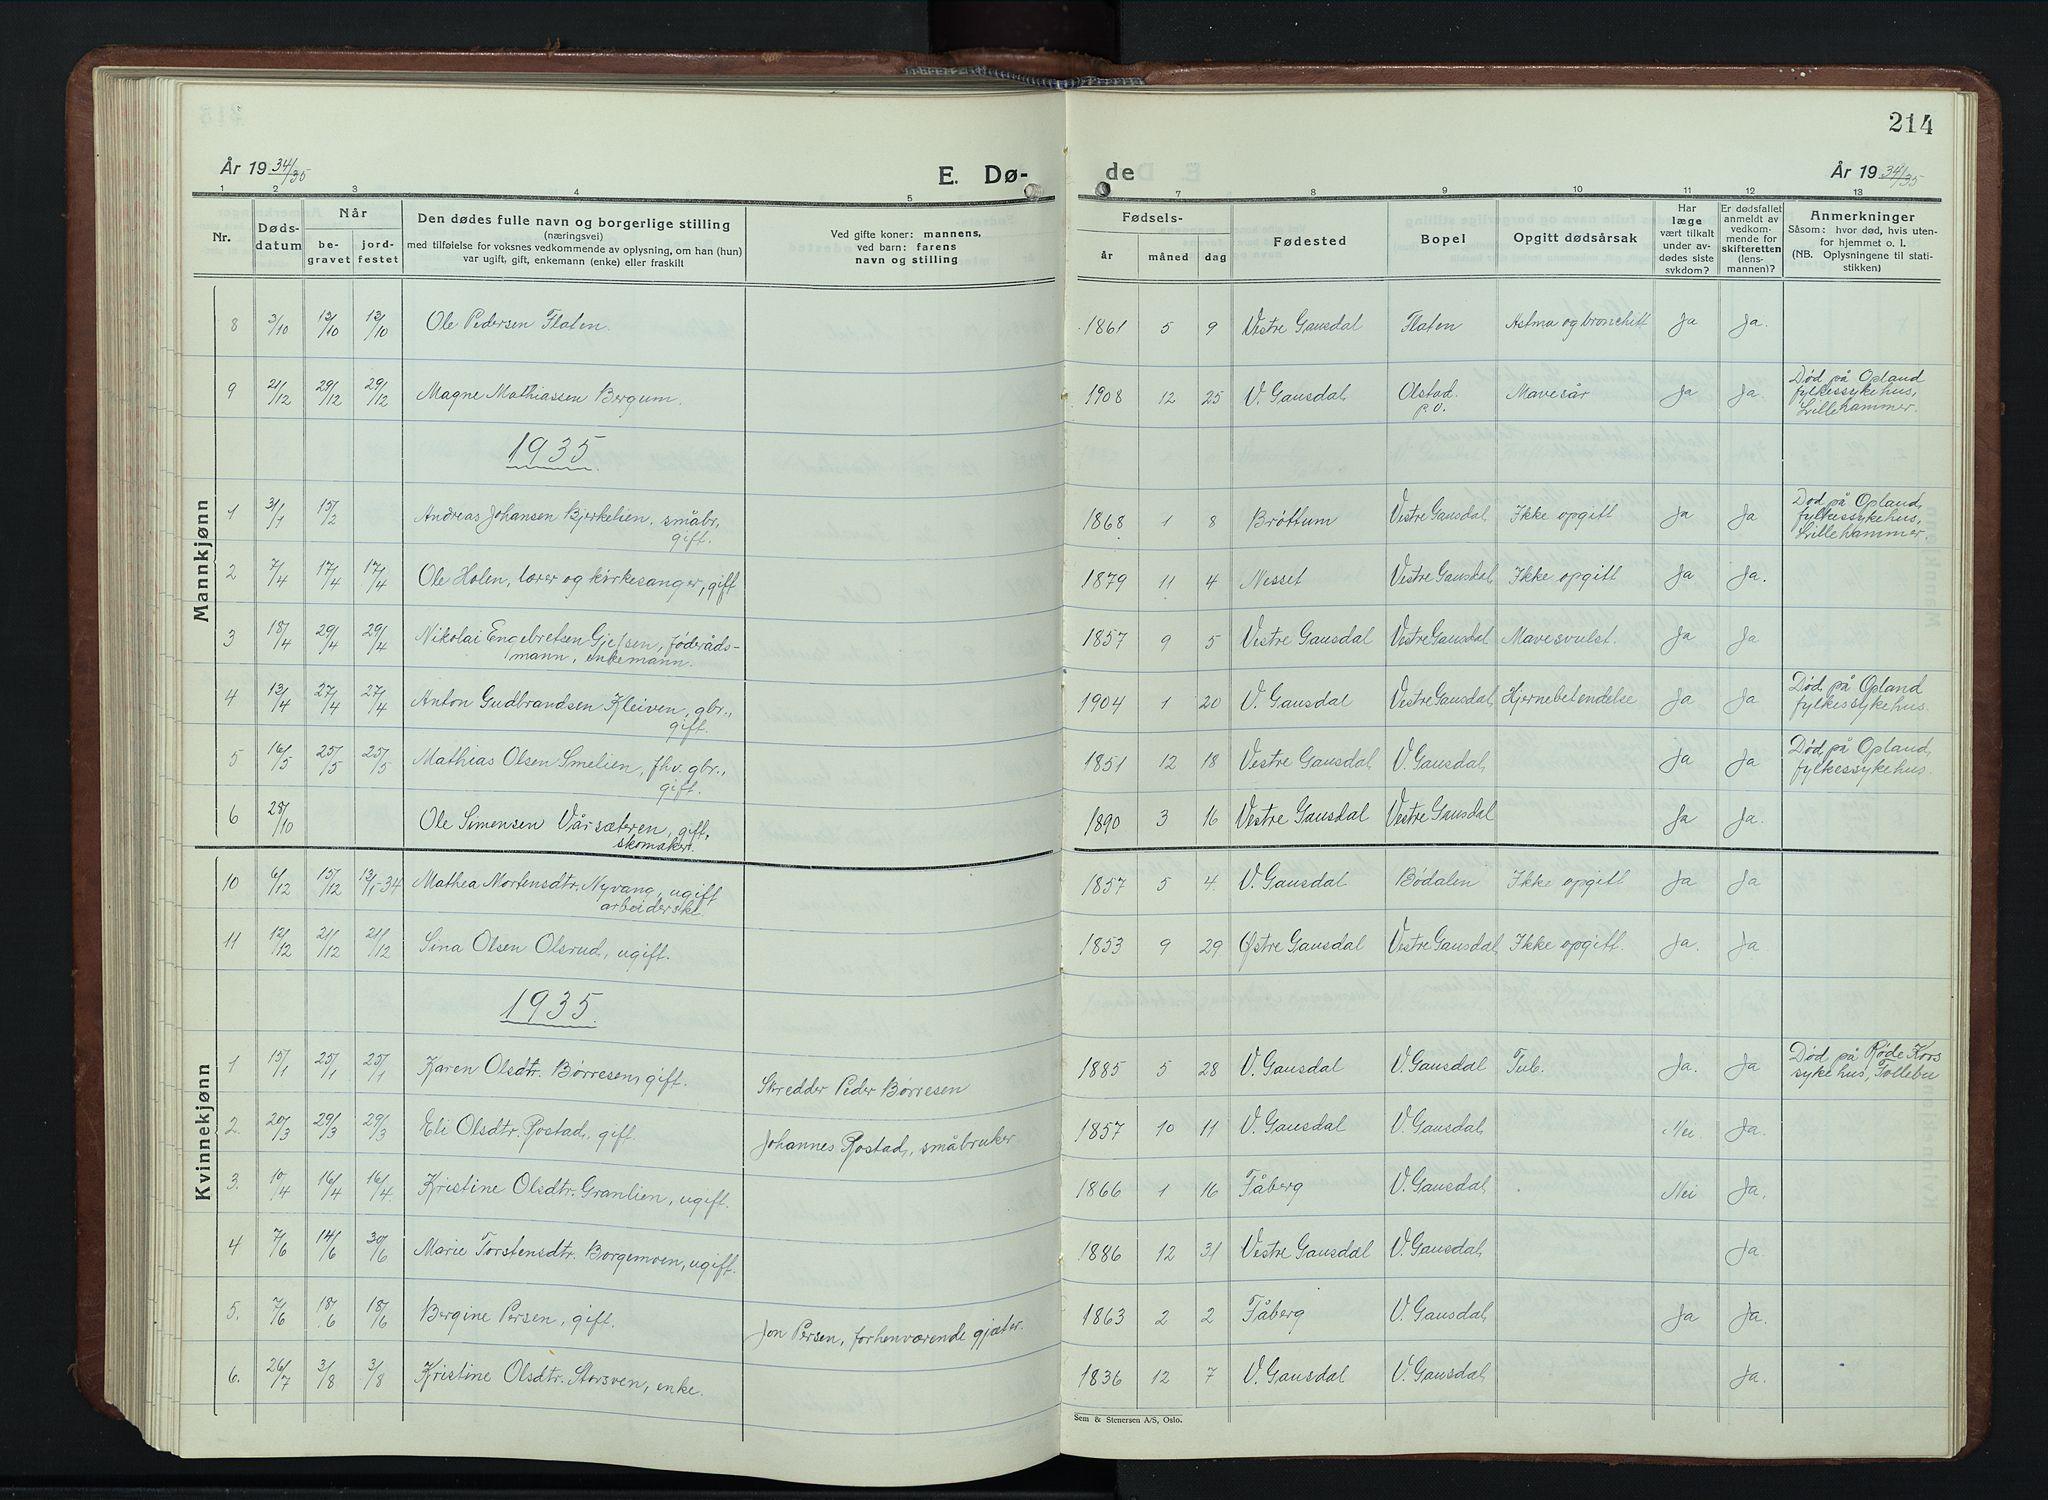 SAH, Vestre Gausdal prestekontor, Klokkerbok nr. 5, 1926-1955, s. 214